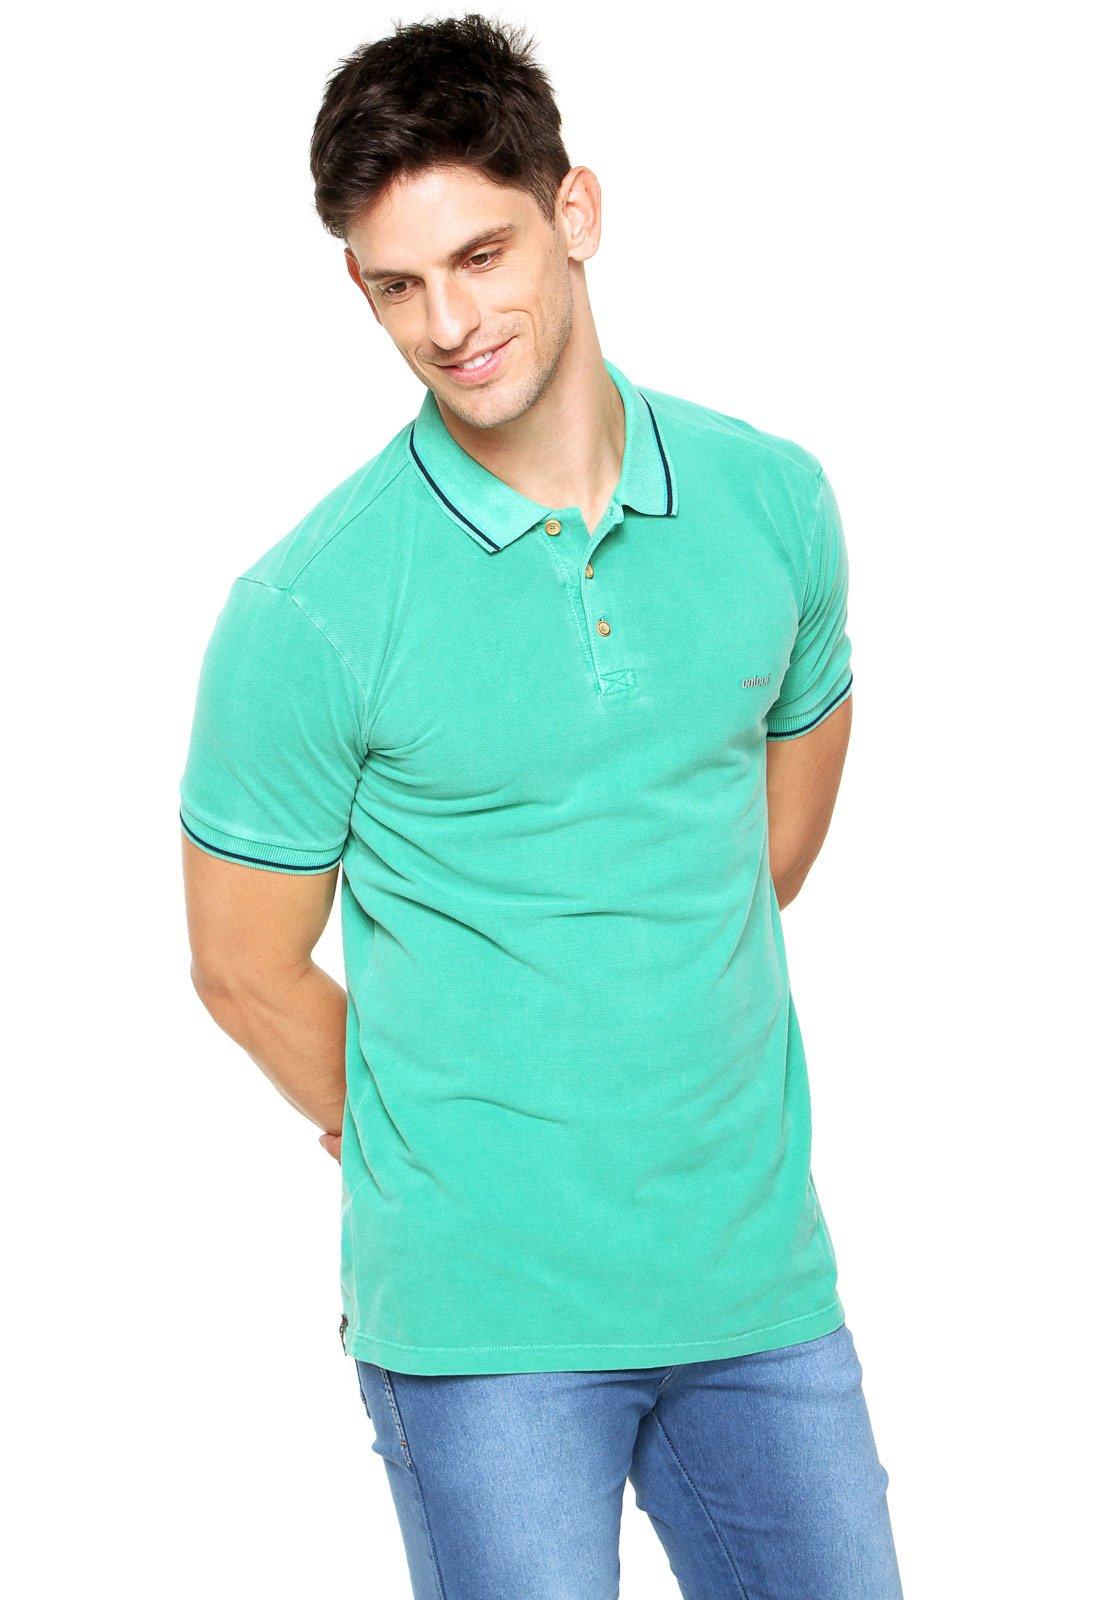 Colcci. Camisa Polo Colcci Brasil Verde a6f6aa148deda